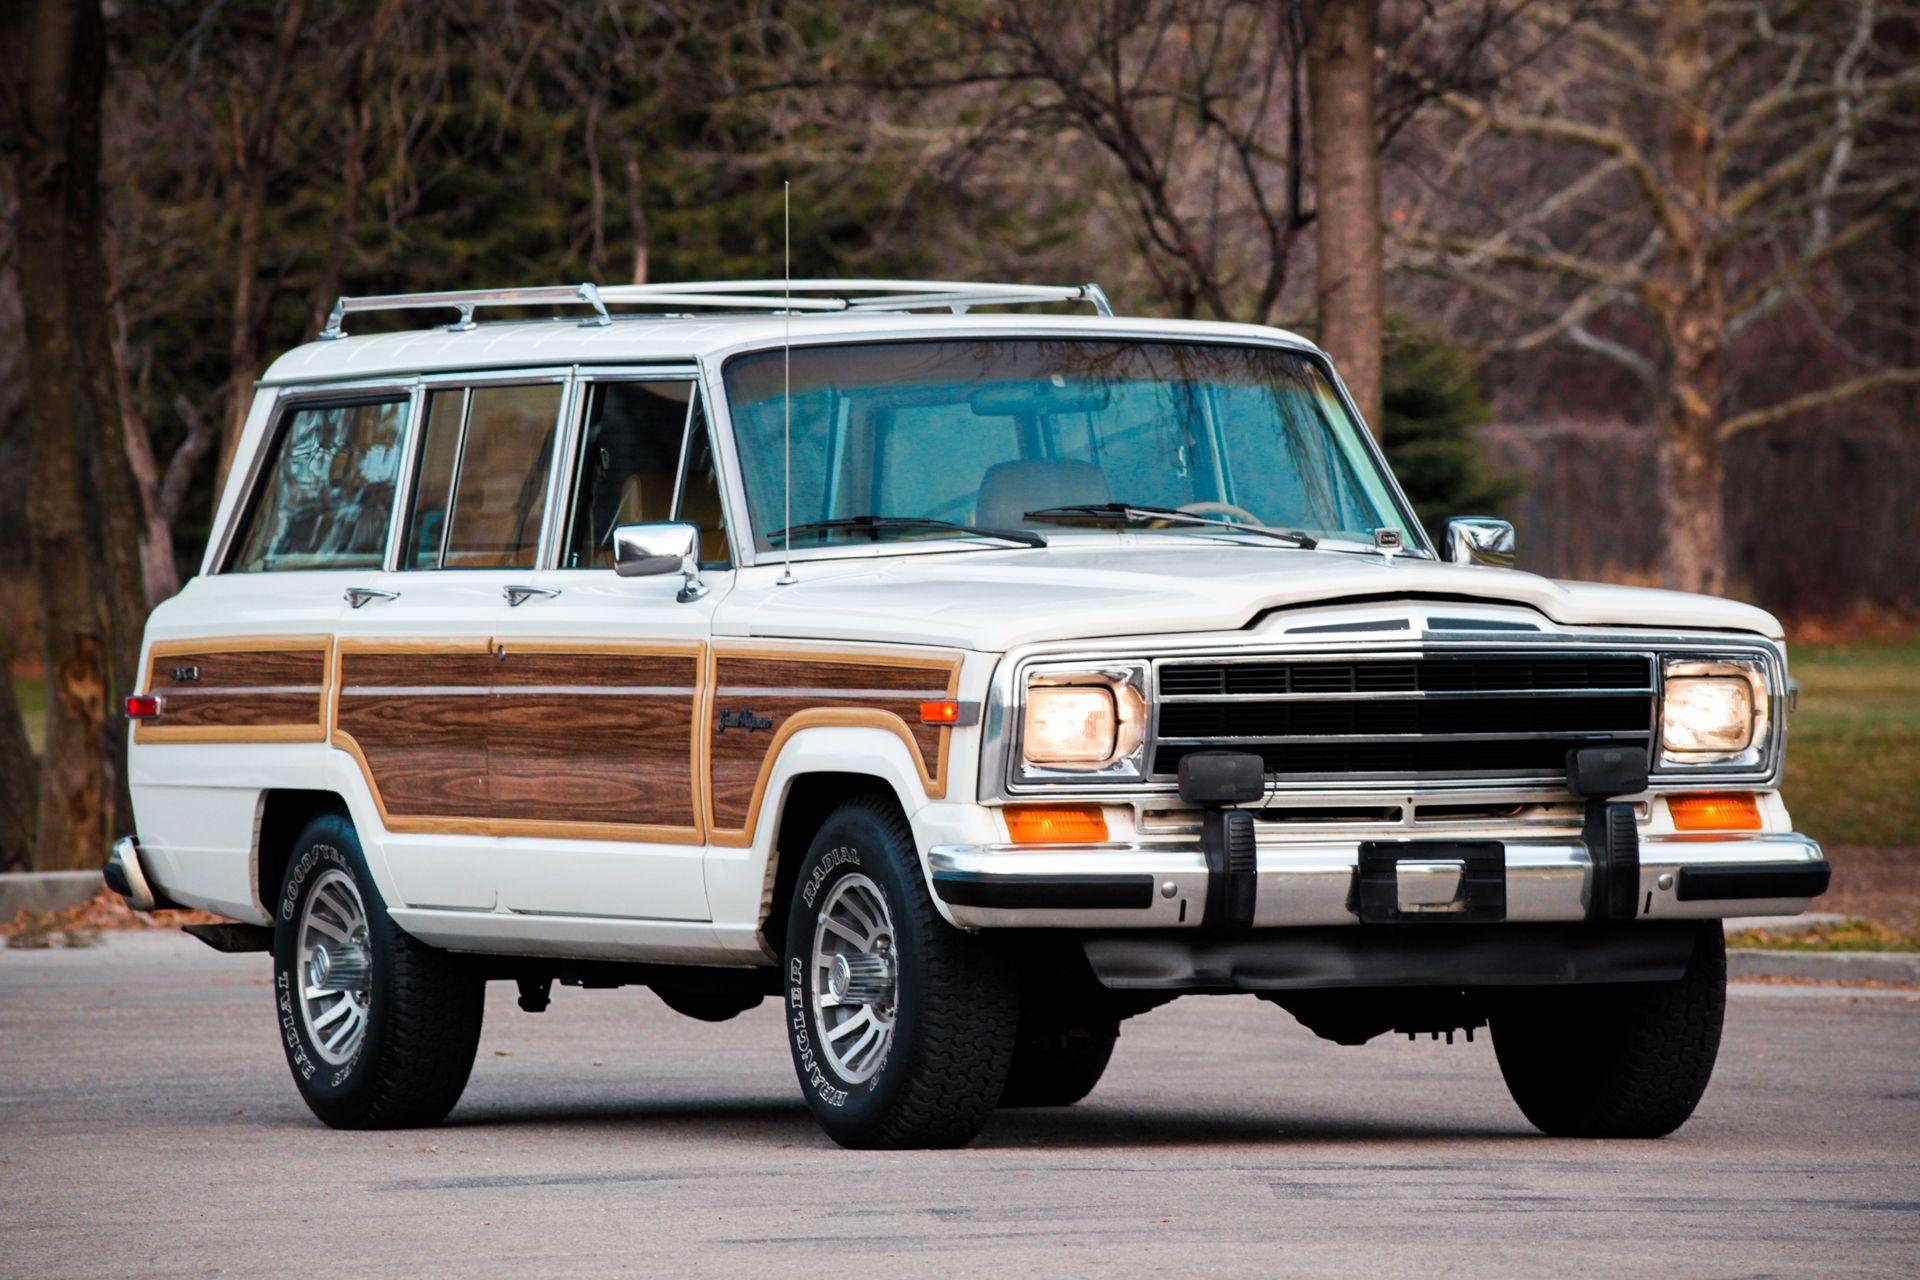 1988 Jeep Grand Wagoneer Jeep wagoneer, Jeep grand, Jeep